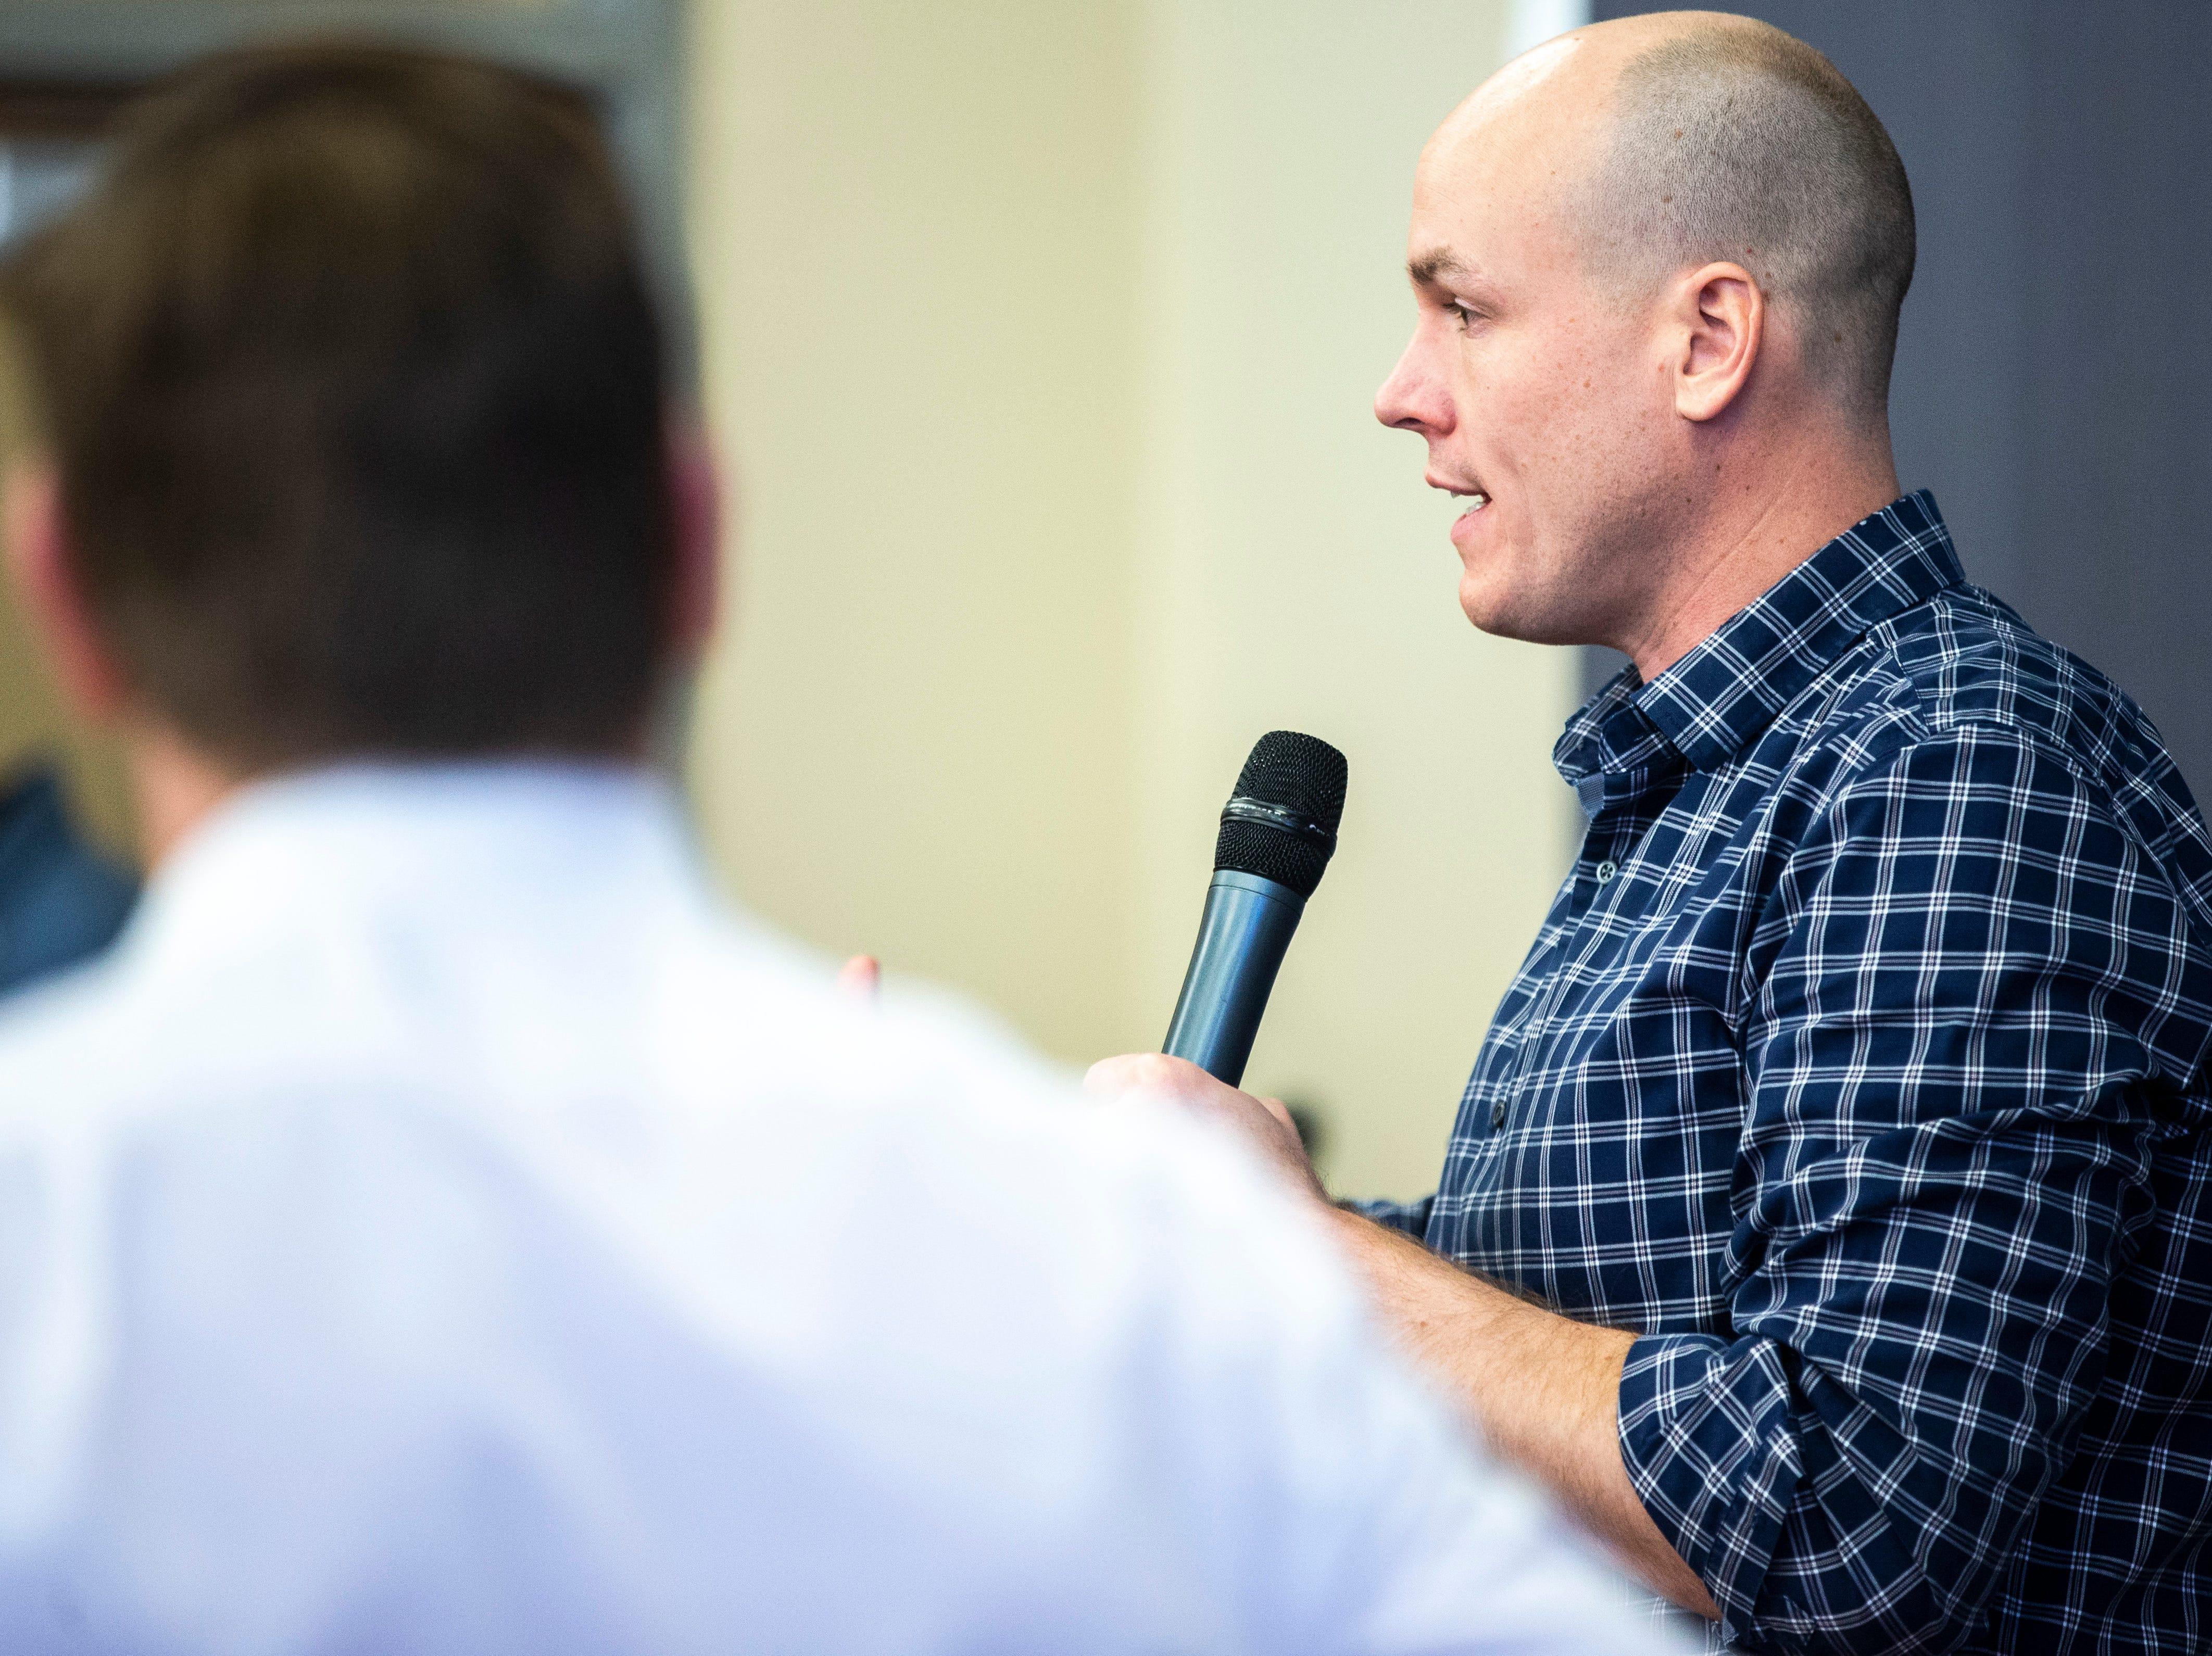 J.D. Scholten, Working Hero Iowa director, speaks during a Working Hero Iowa event on Monday, Feb. 18, 2019 at the Public Library in Iowa City, Iowa.